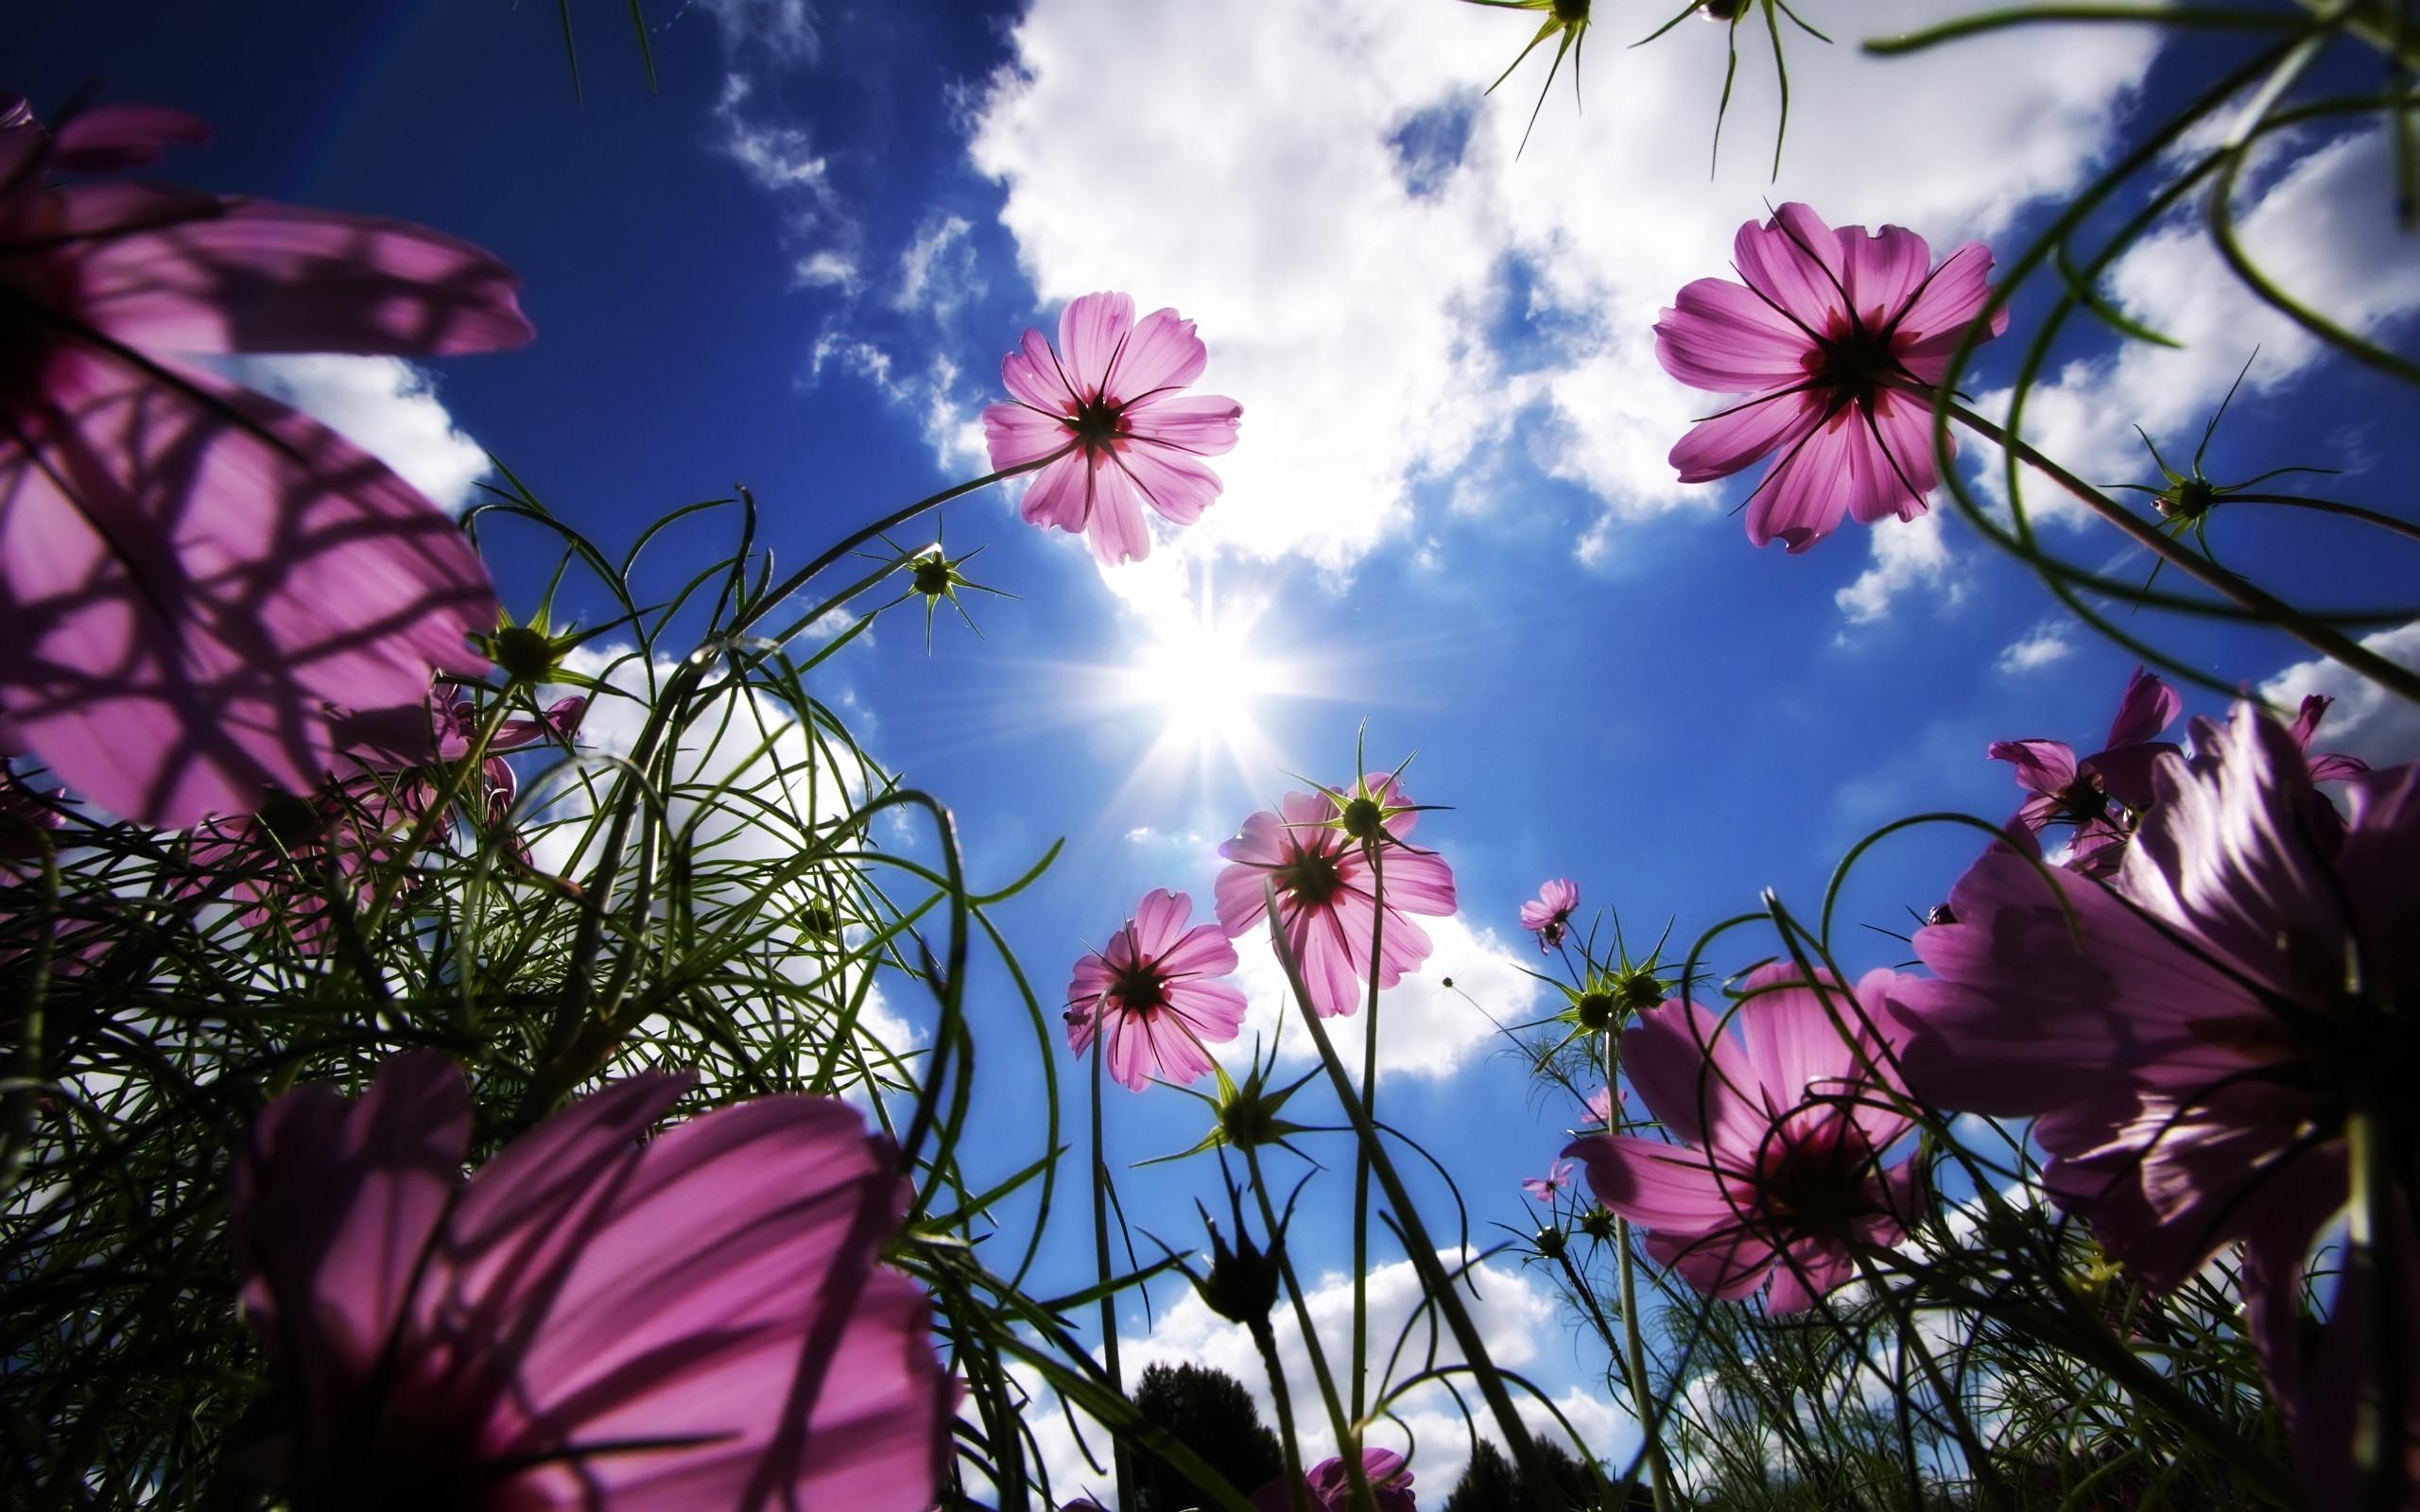 Spring Pink Flowers Wallpaper – Wallpaper, High Definition, High .